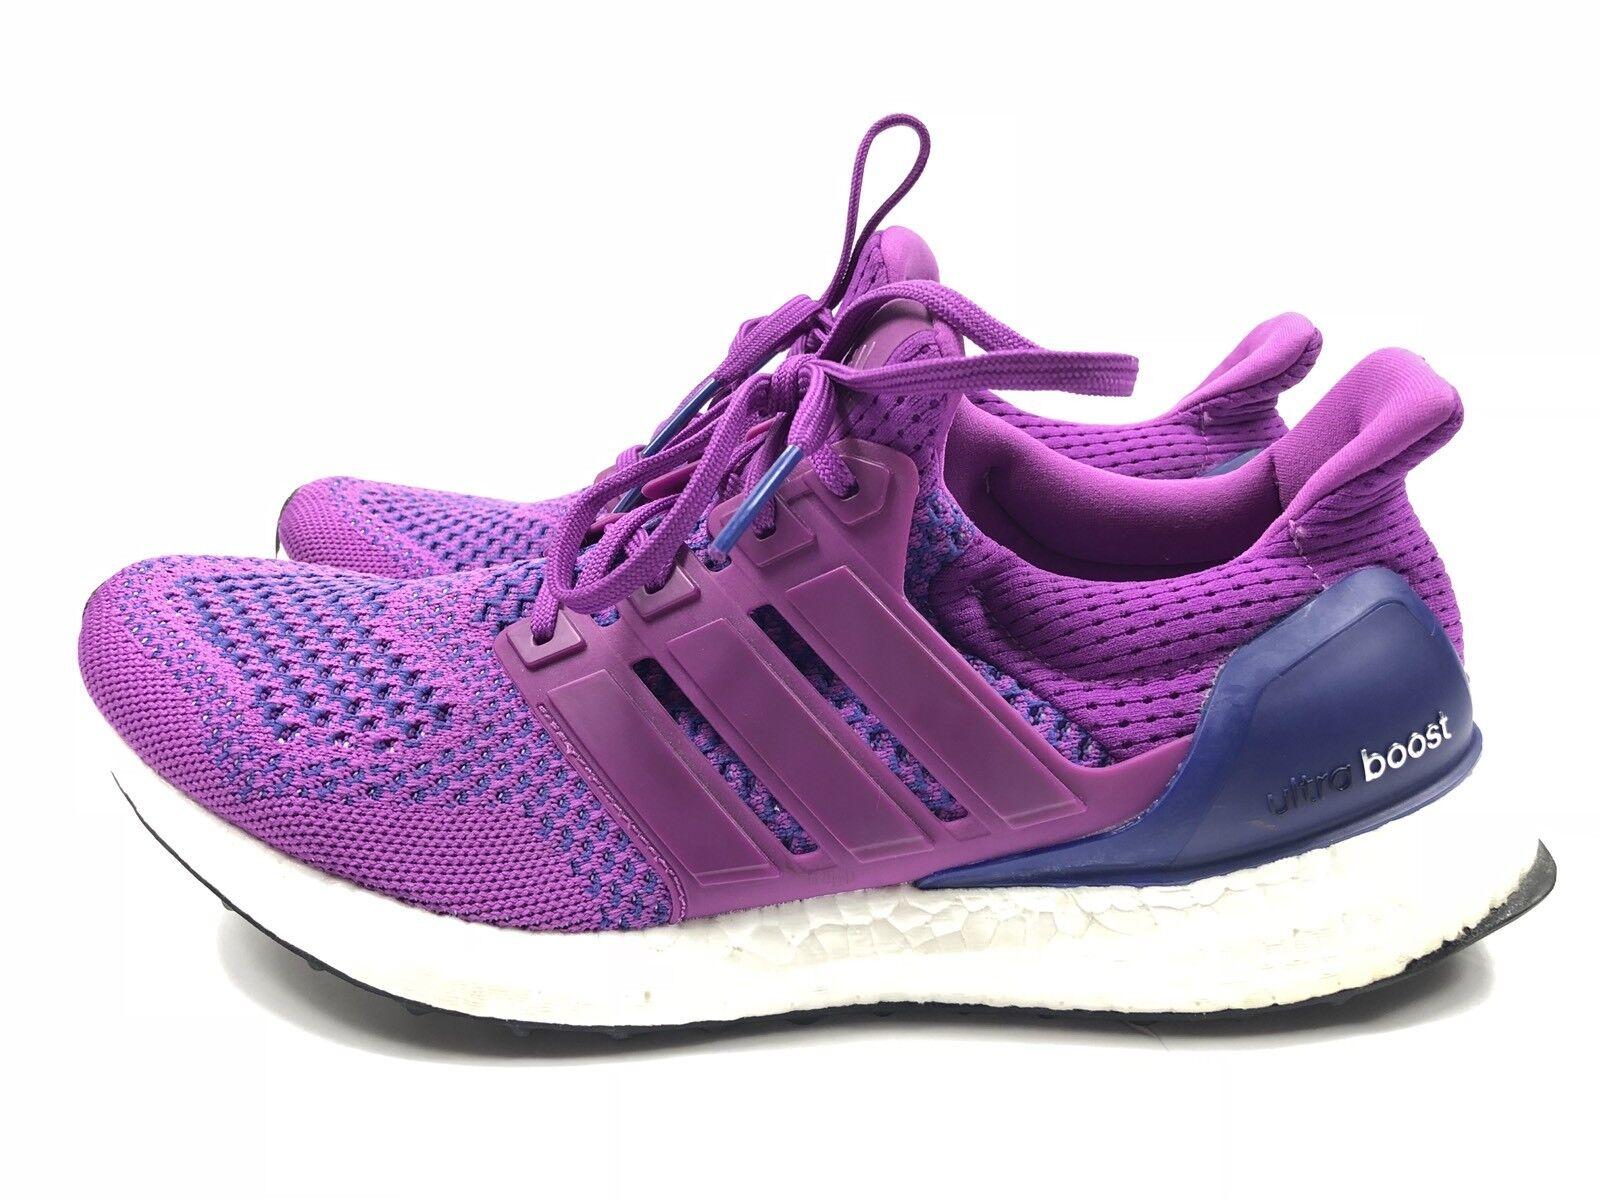 Adidas Women's Purple Primeknit Ultra Boost 1.0 Running shoes 9.5